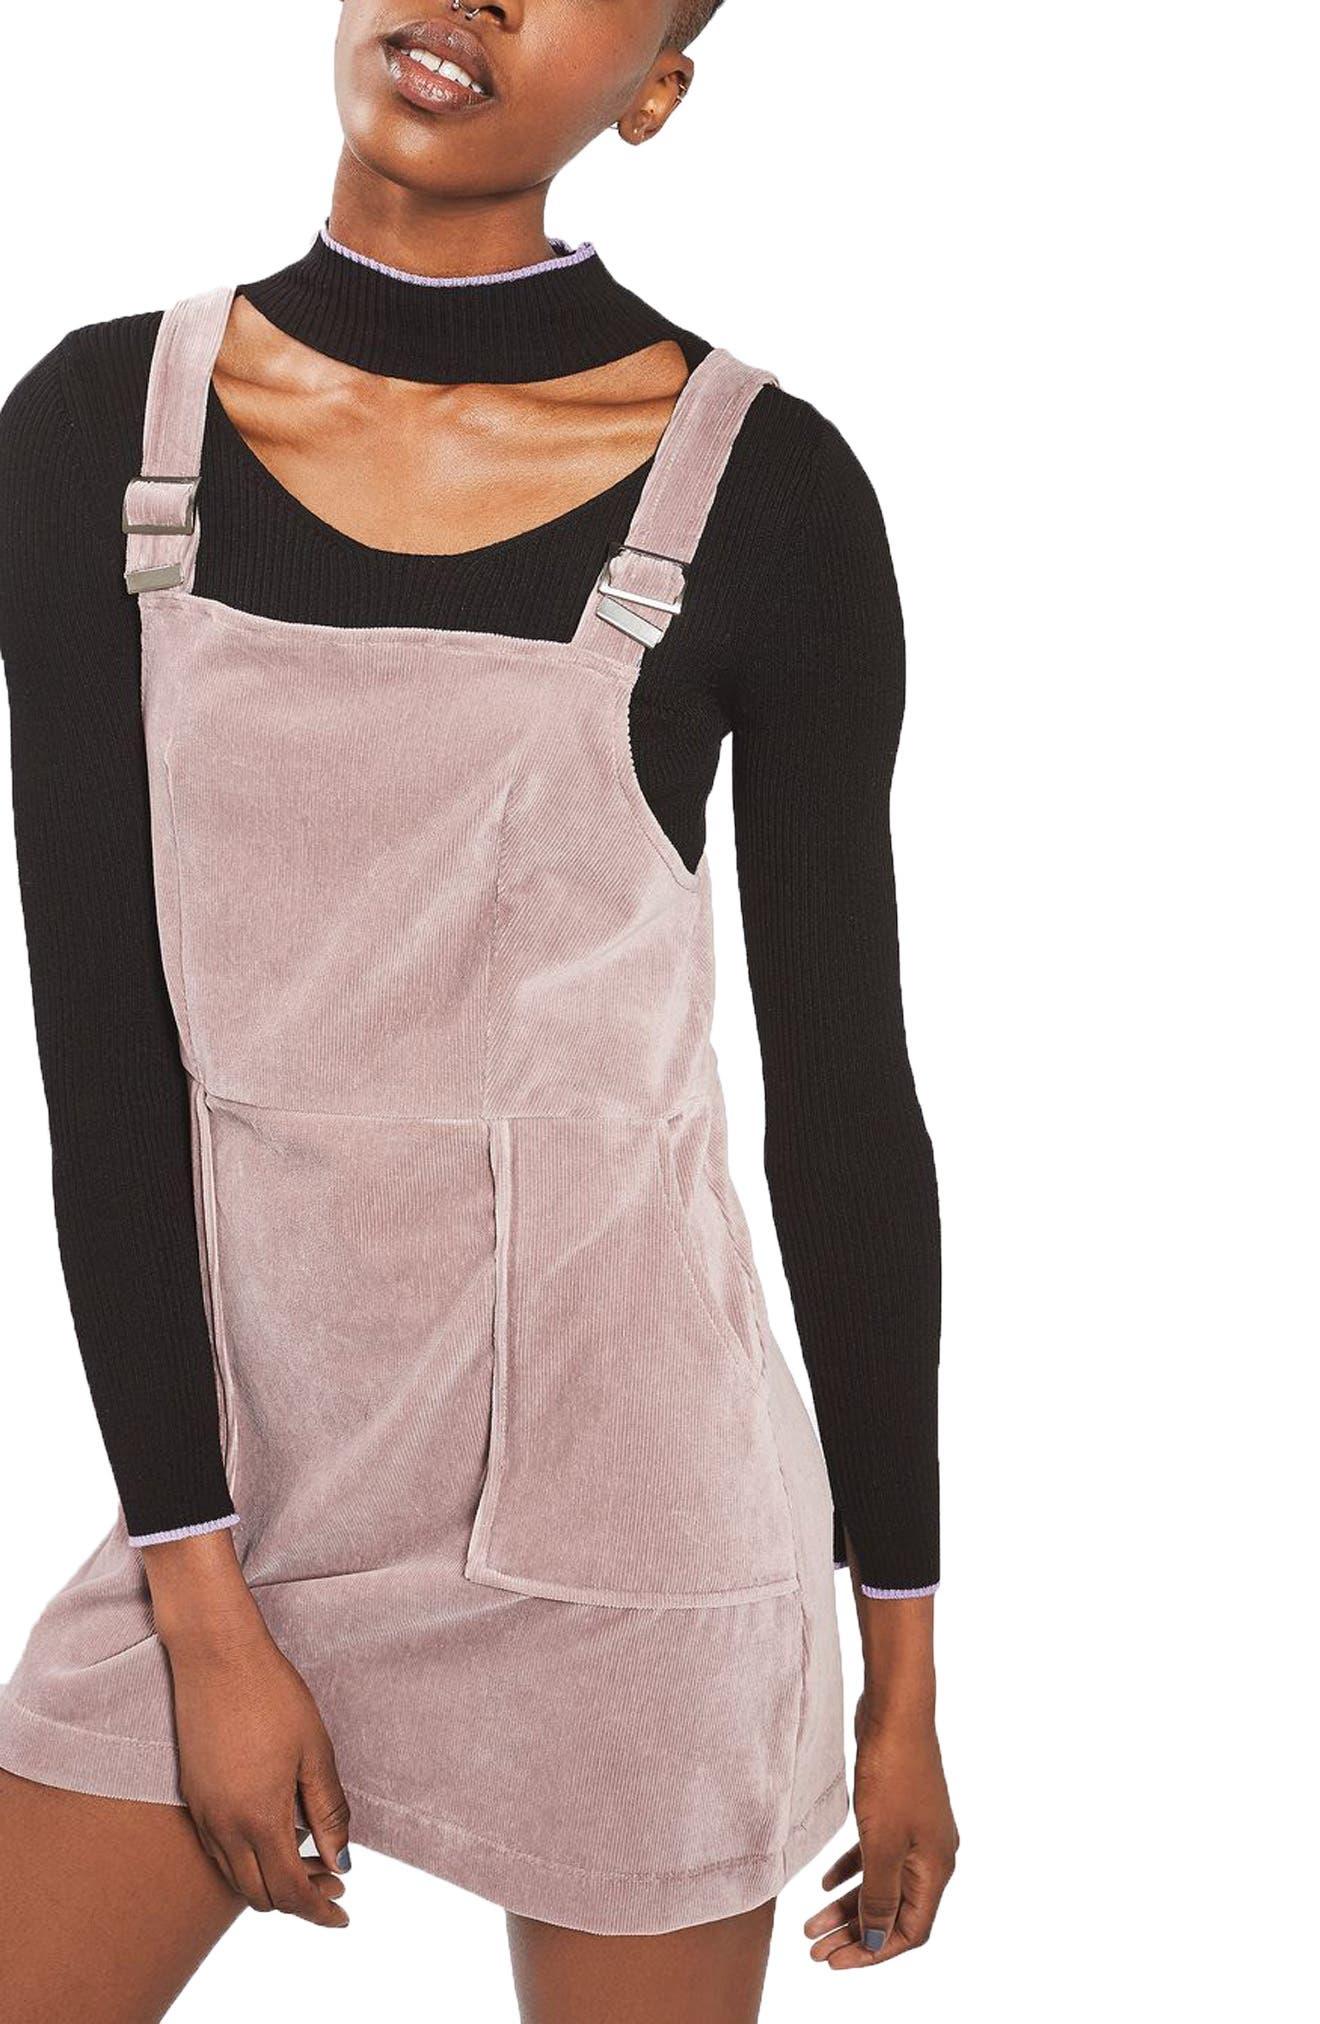 Alternate Image 1 Selected - Topshop Velvet Corduroy Pinafore Dress (Petite)